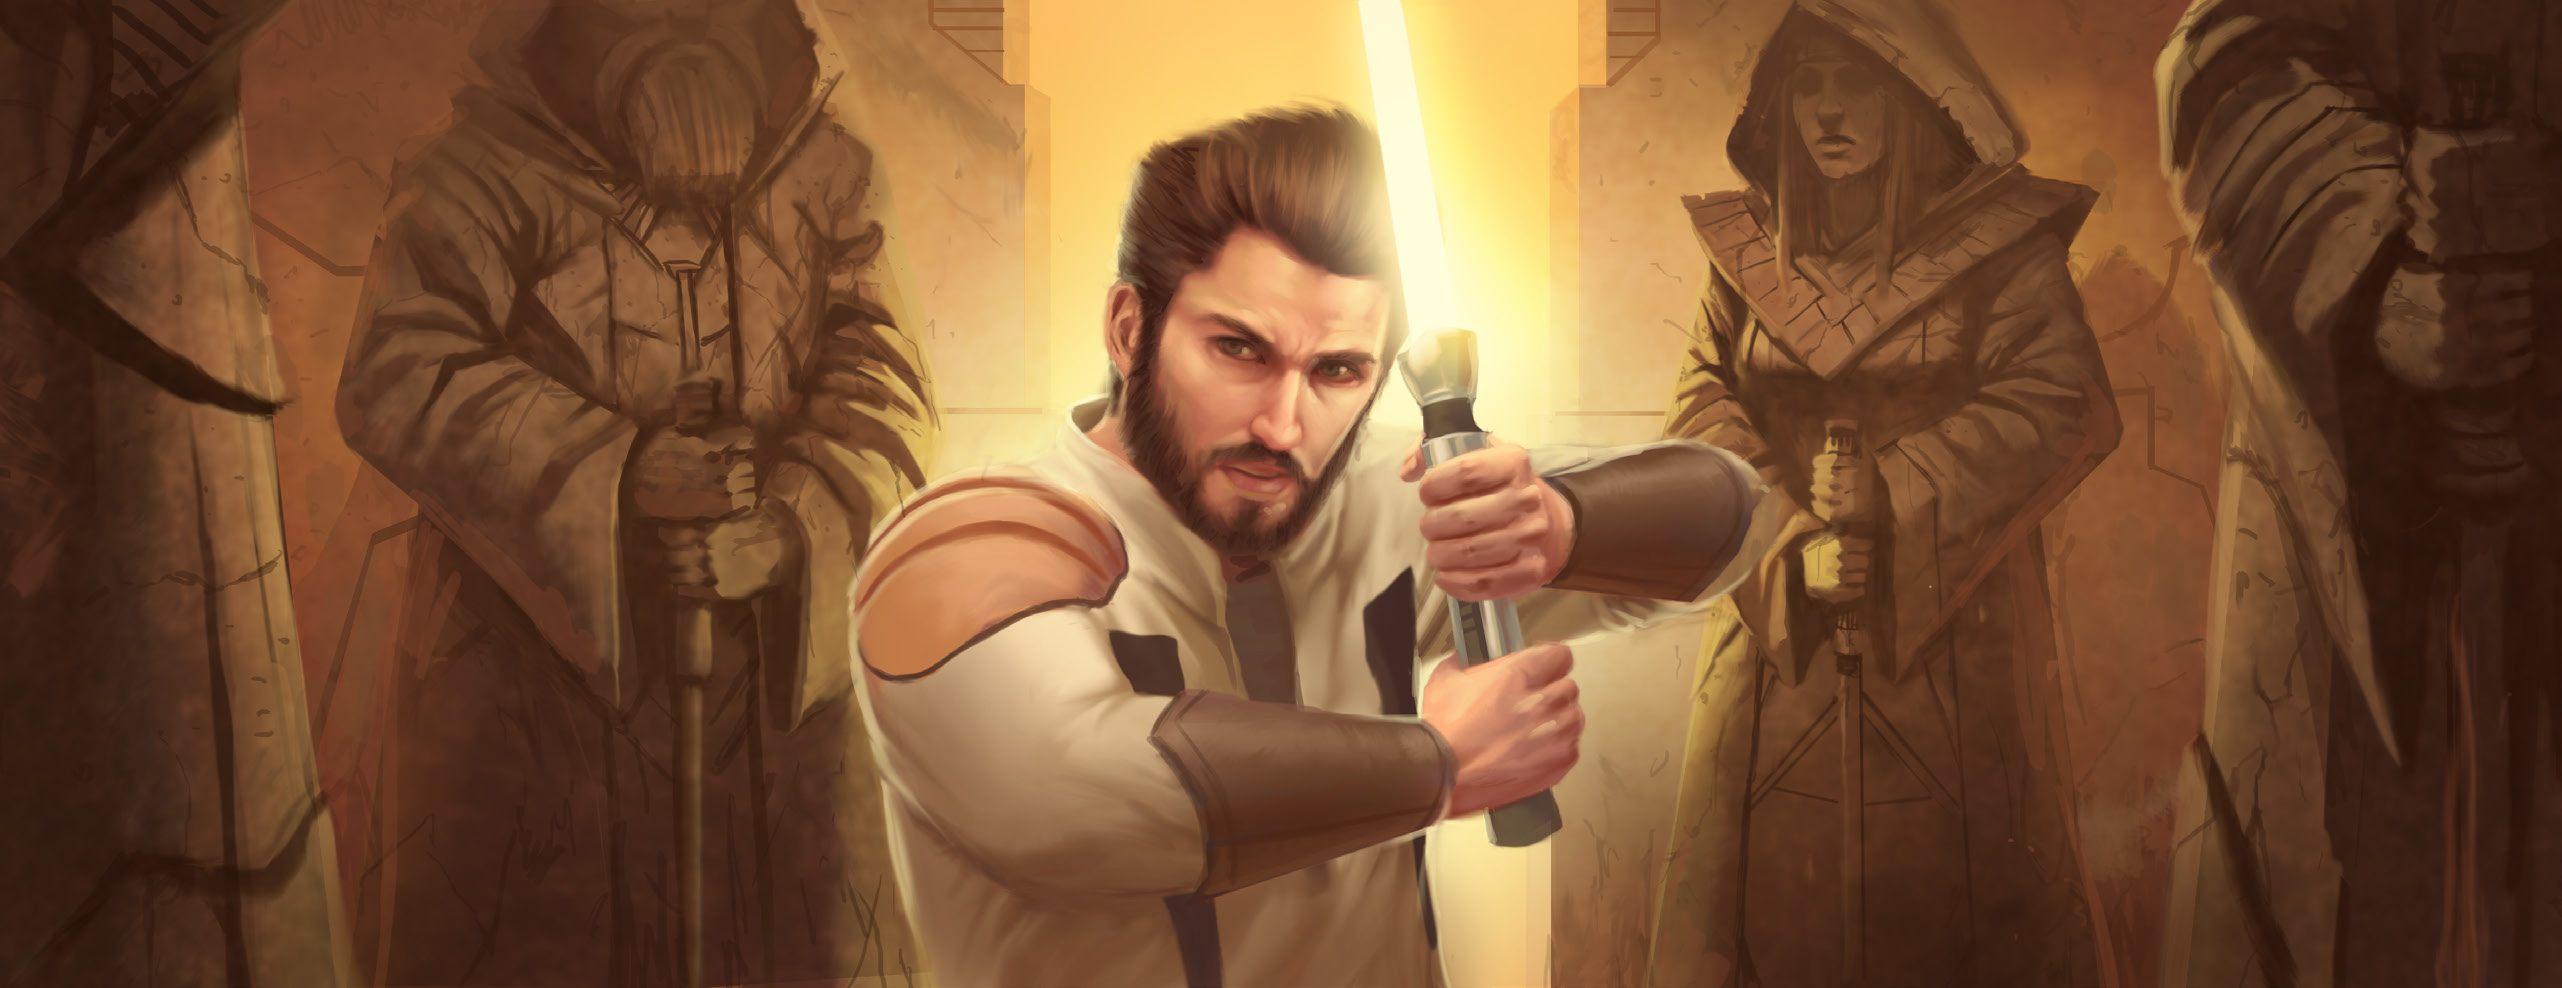 Kyle Katarn - Star Wars